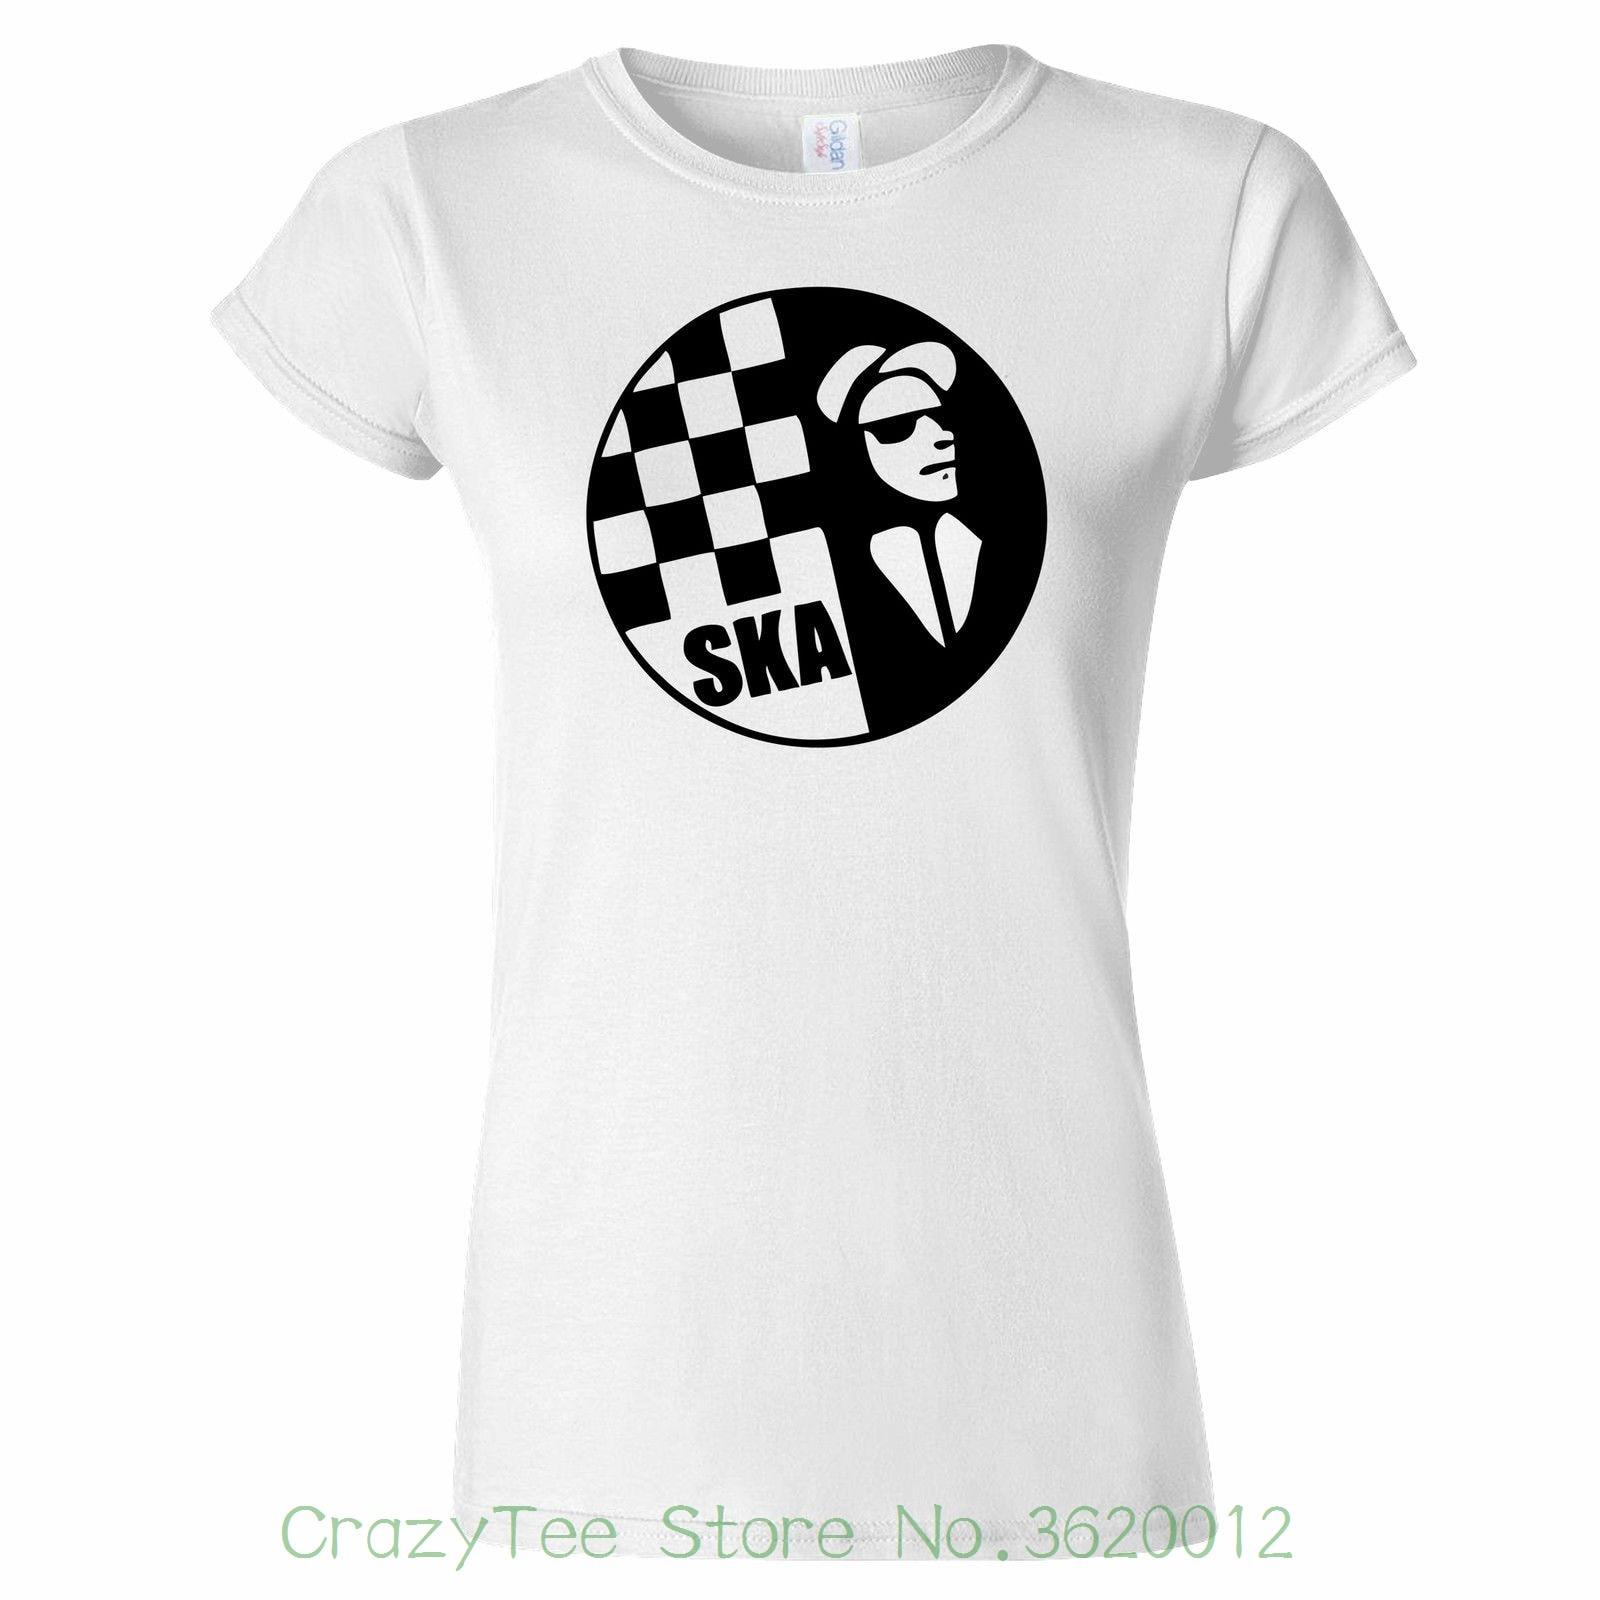 Camiseta de mujer Ska Circle con Cheques, camiseta para mujer, 2 tonos Ska Madness The Beat Rude Boy, camiseta para mujer, 2018 algodón de verano